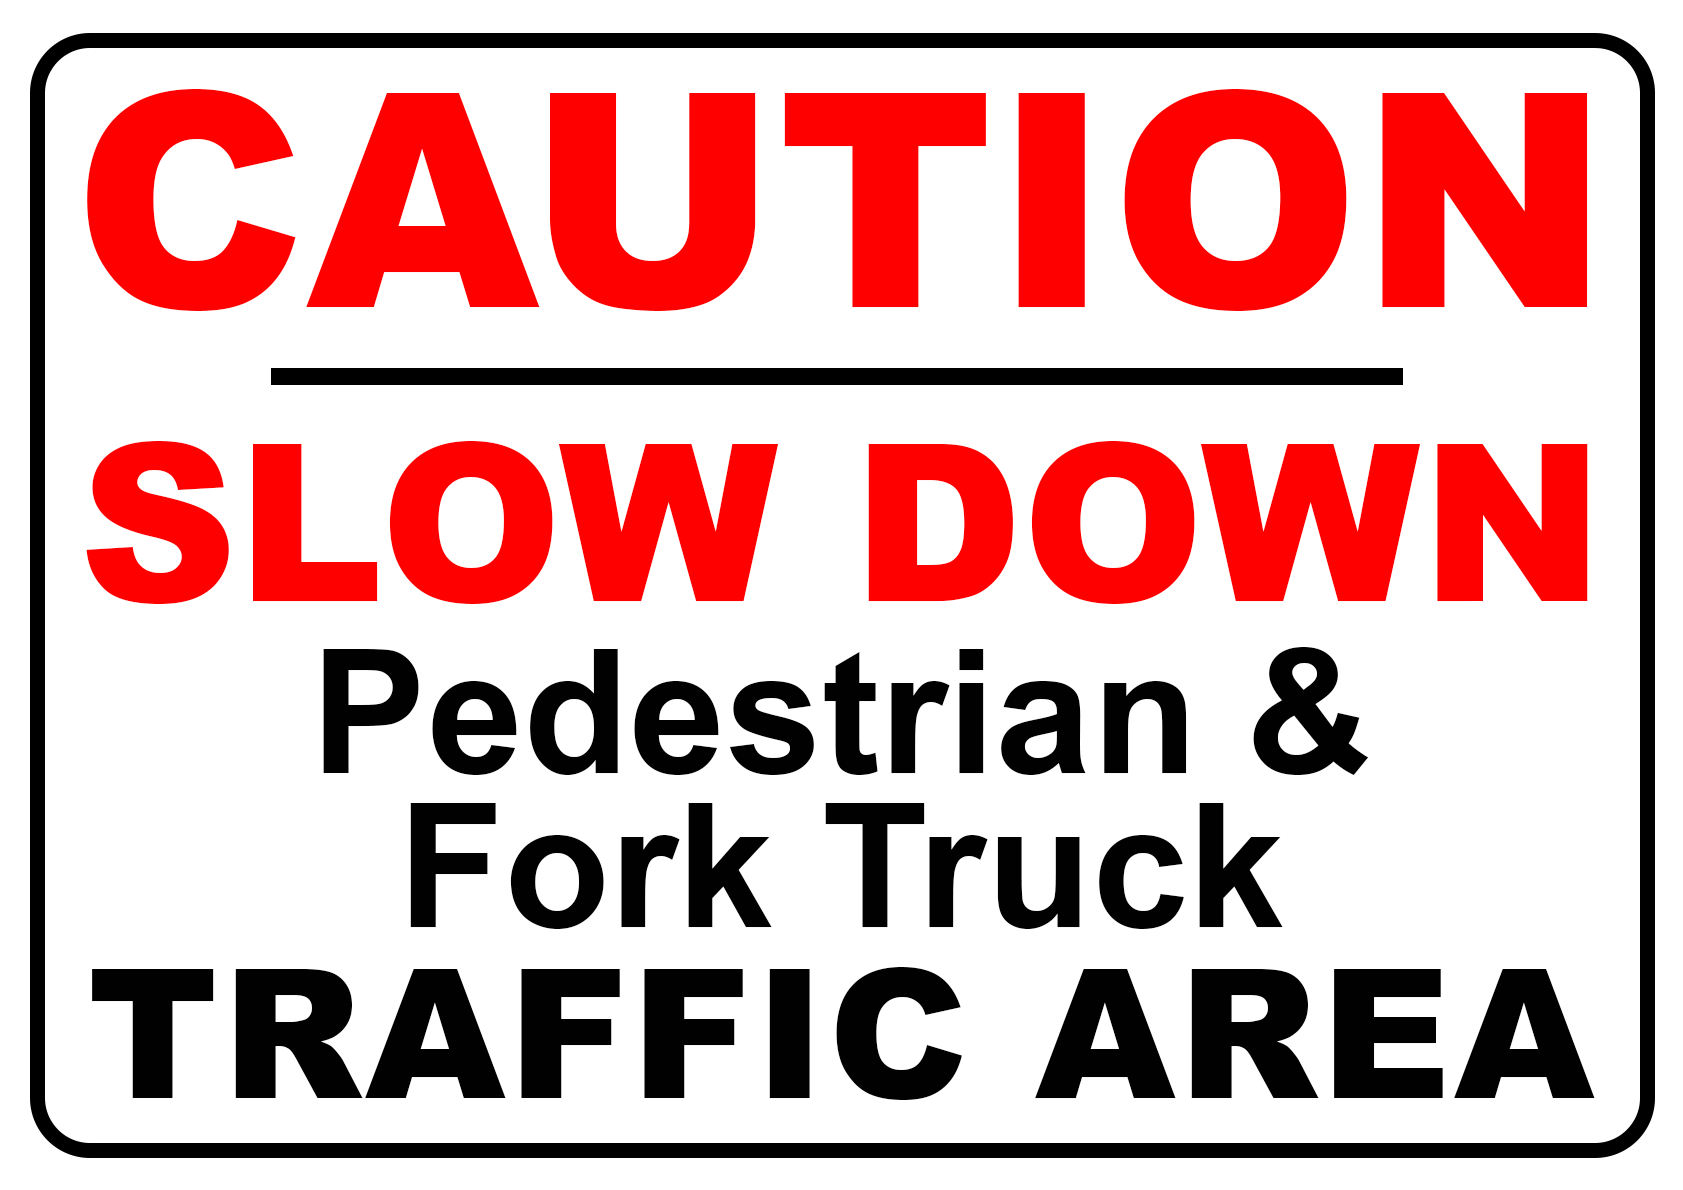 Caution Slow Down